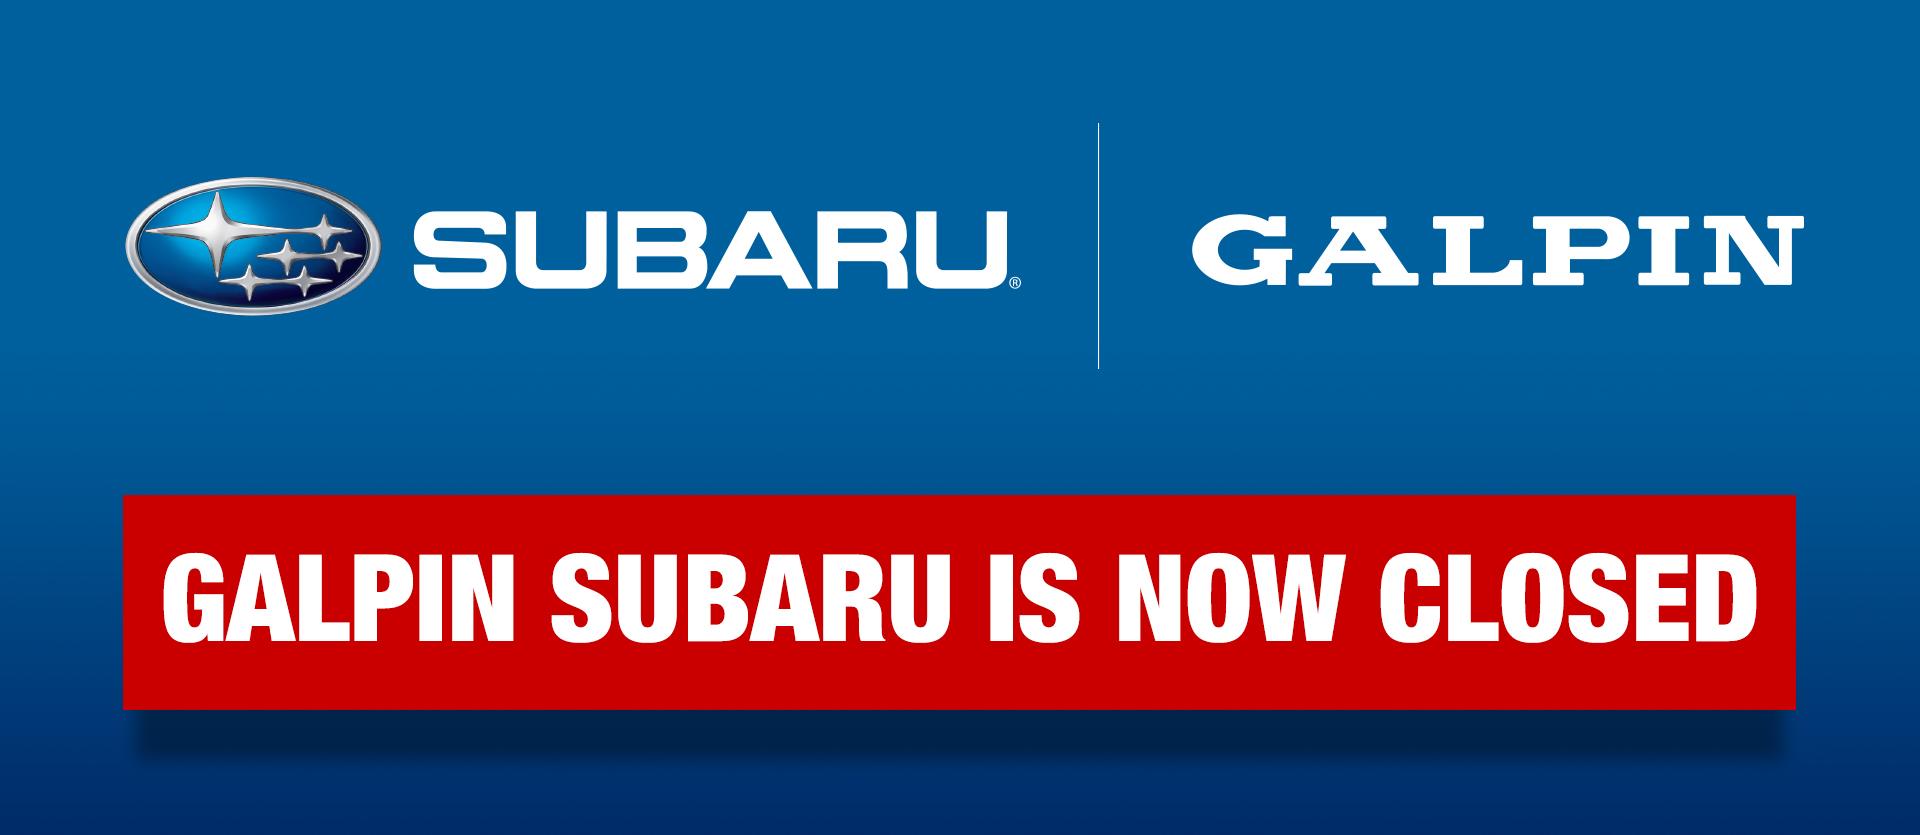 Chase Auto Finance Subaru >> Galpin Subaru Closing